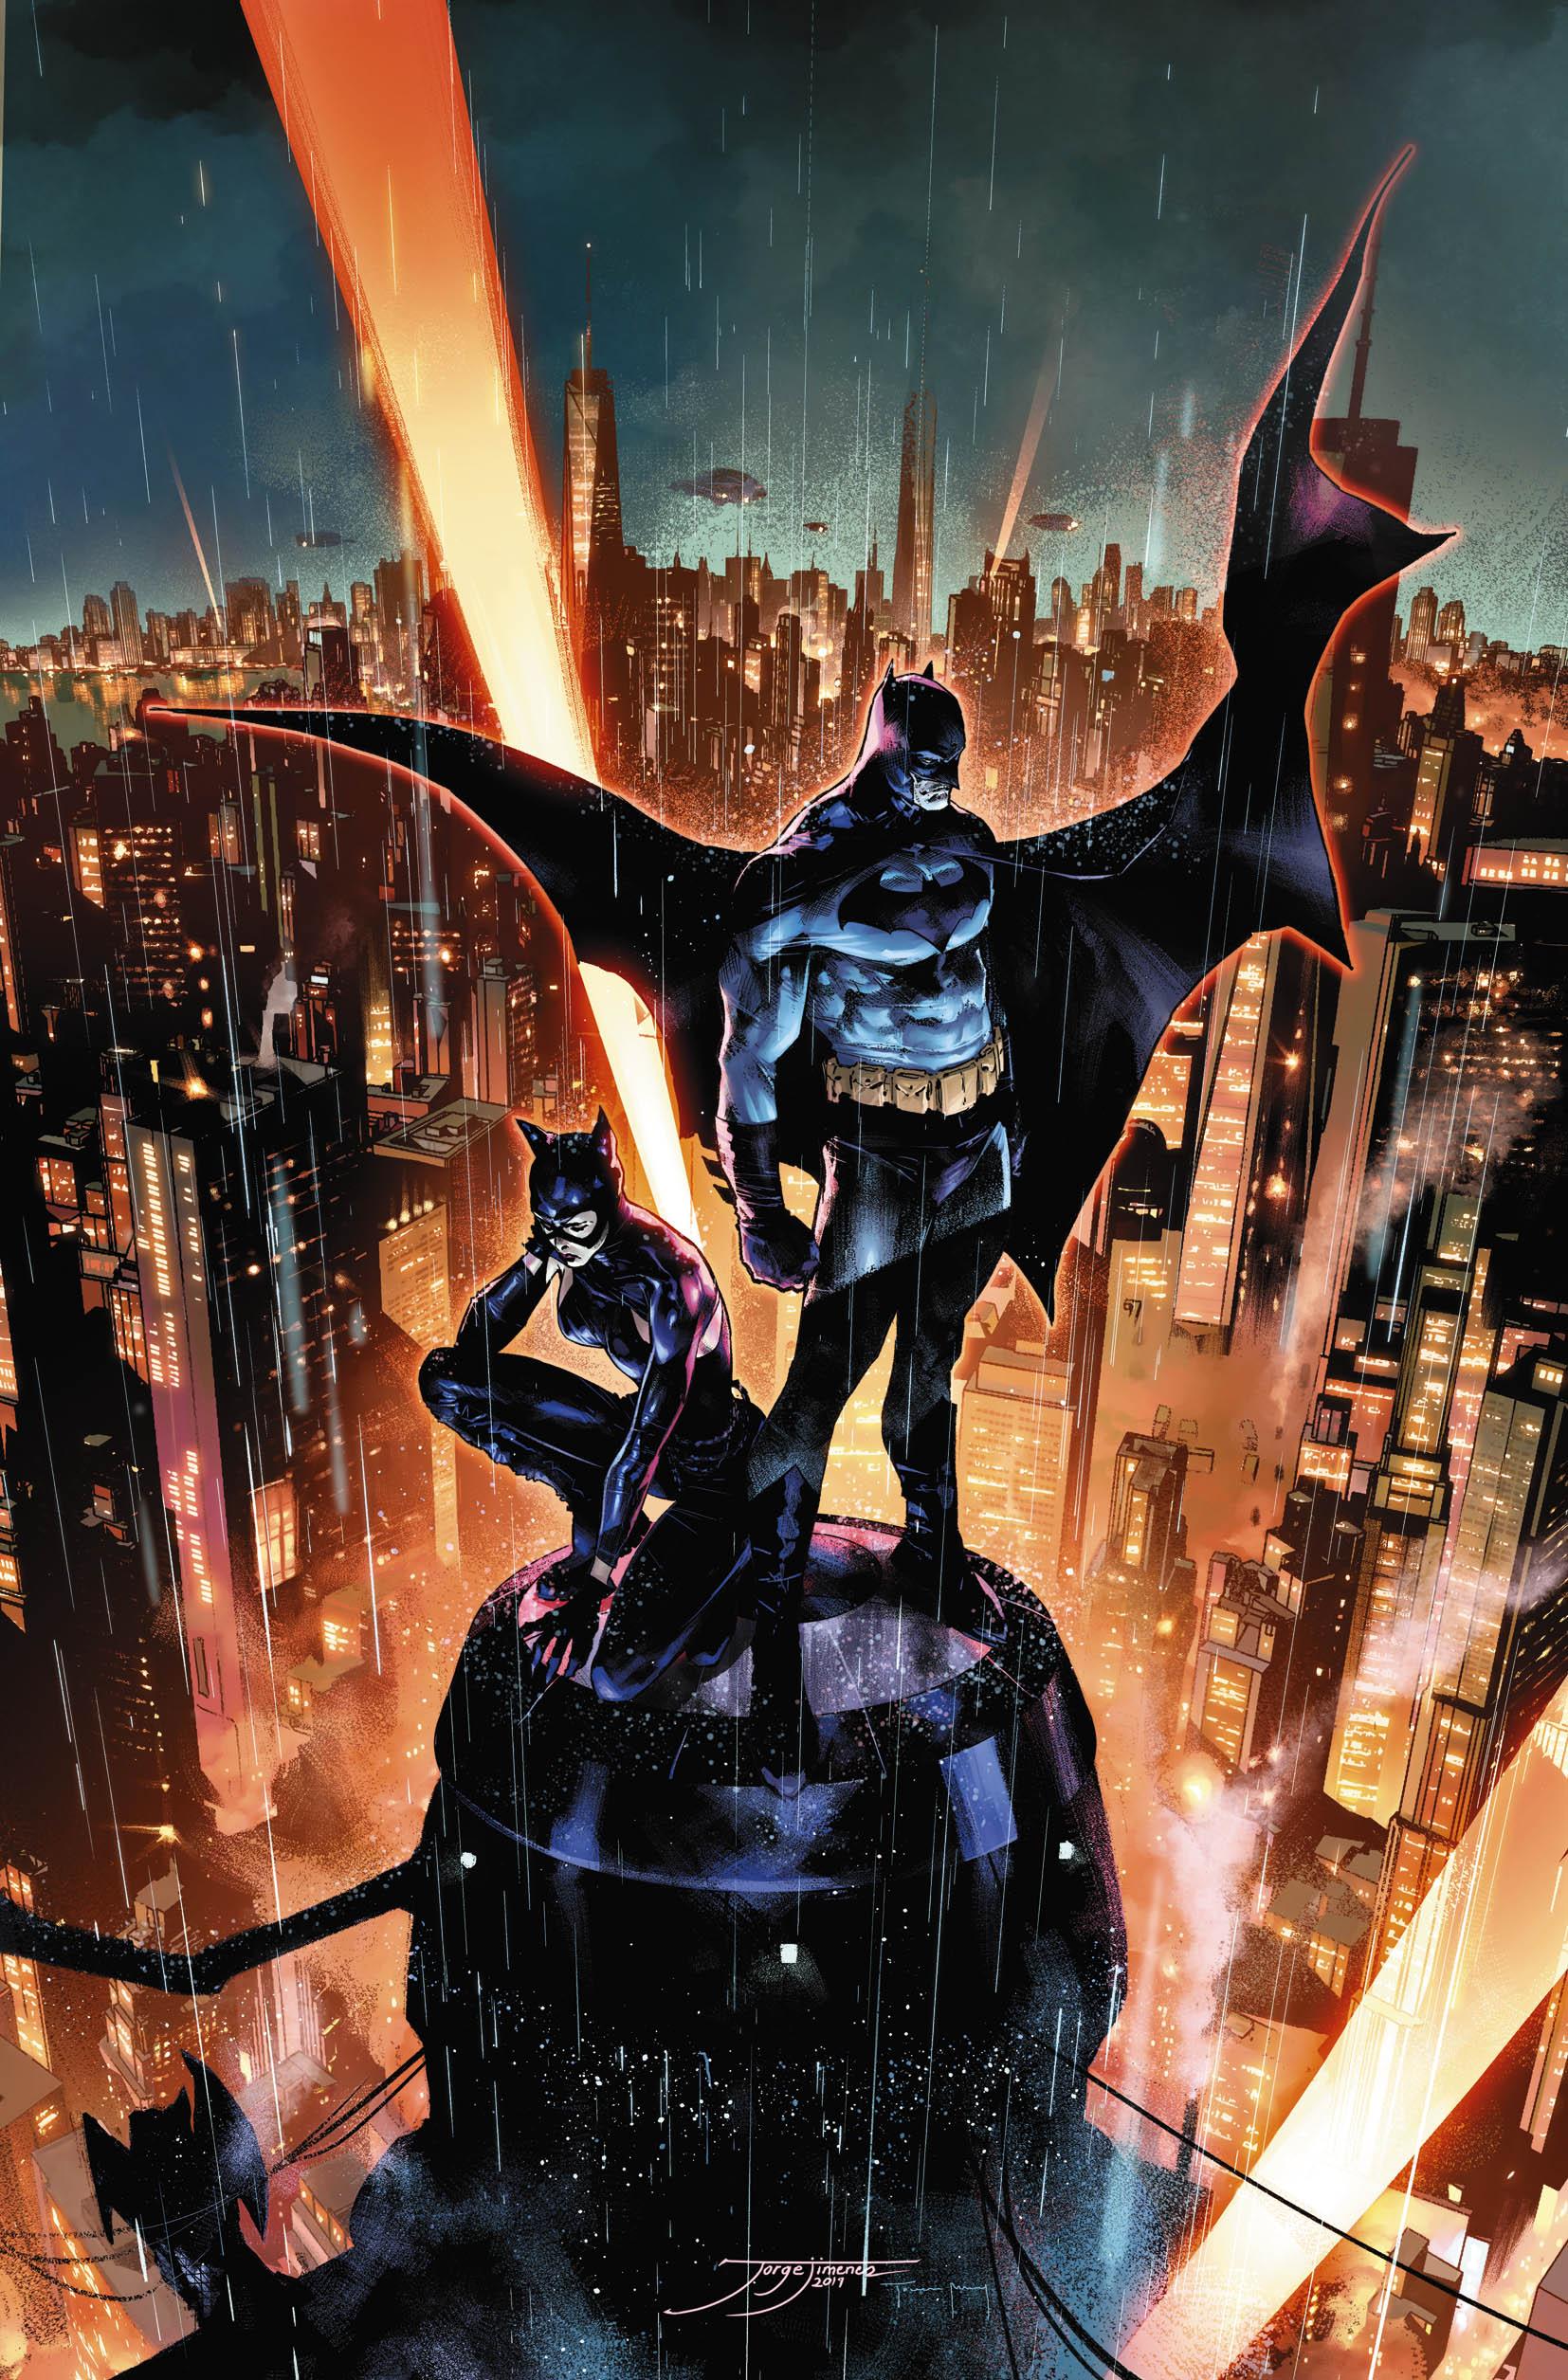 Batman #90 by Jorge Jimenez and Tomeu Morey